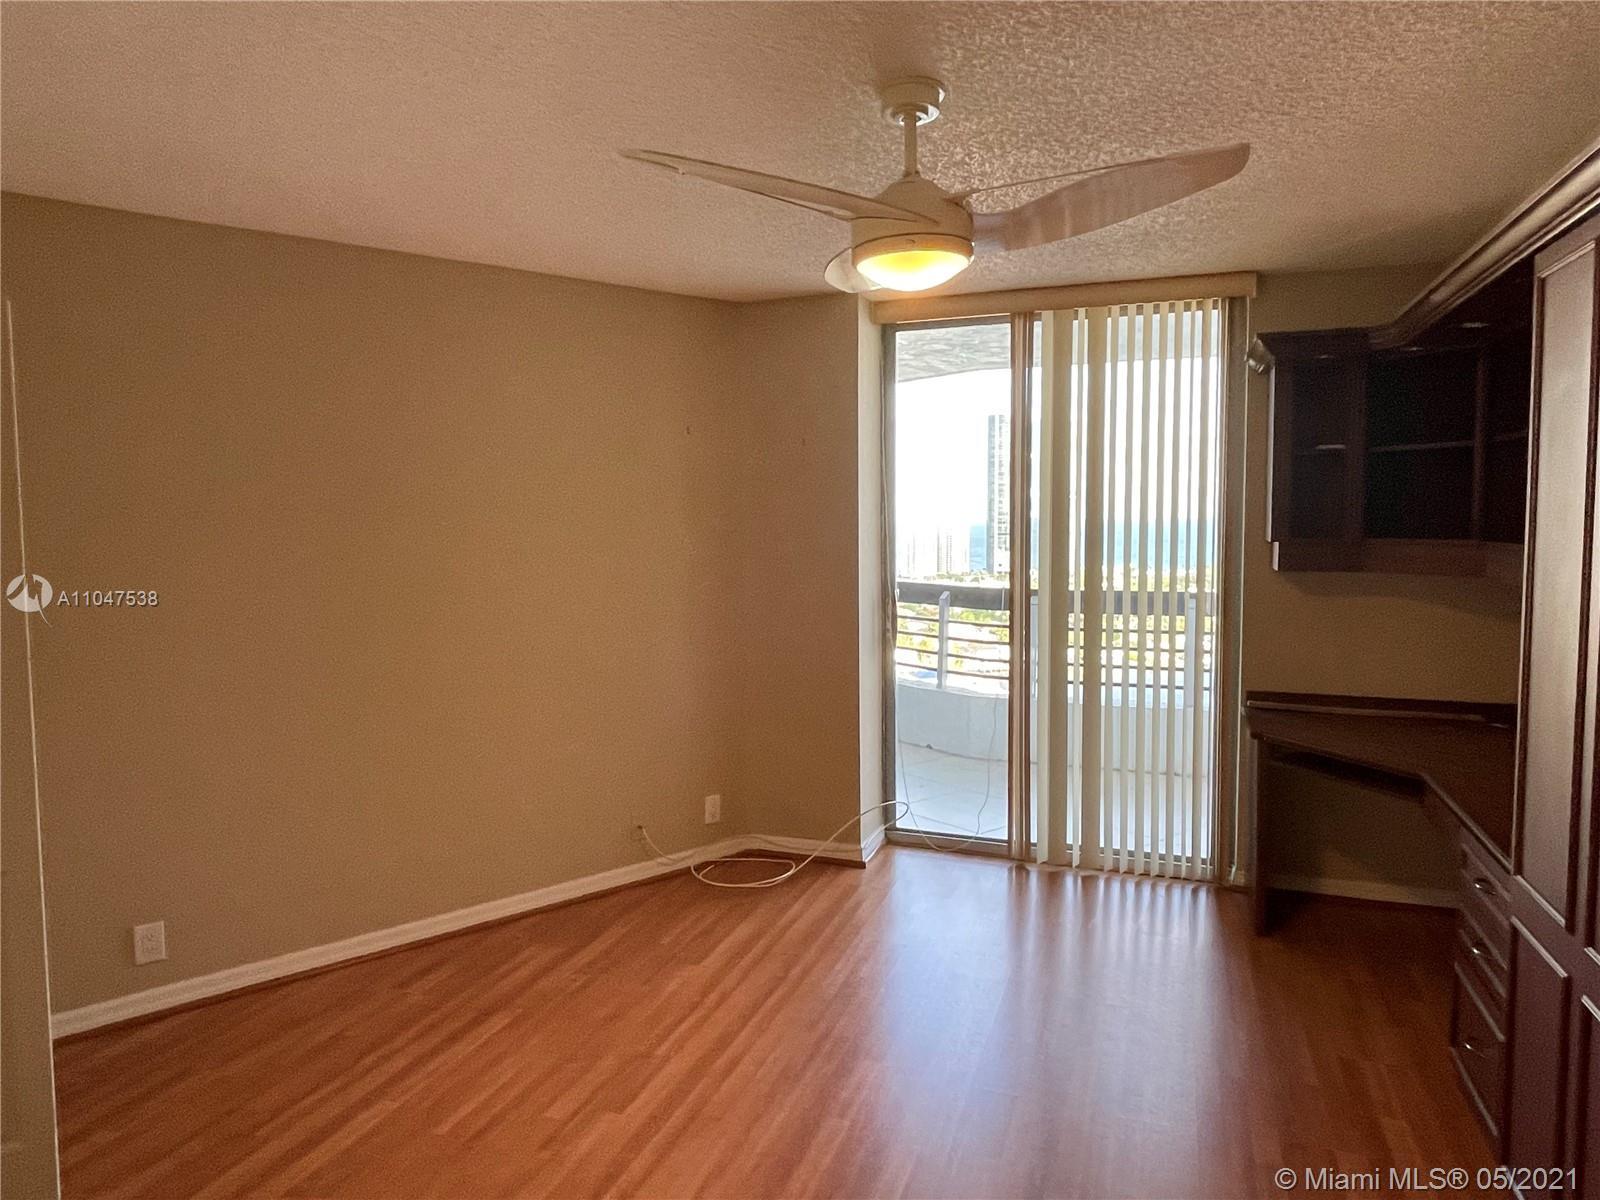 Photo of 3530 Mystic Pointe Dr #3111, Aventura, Florida, 33180 -